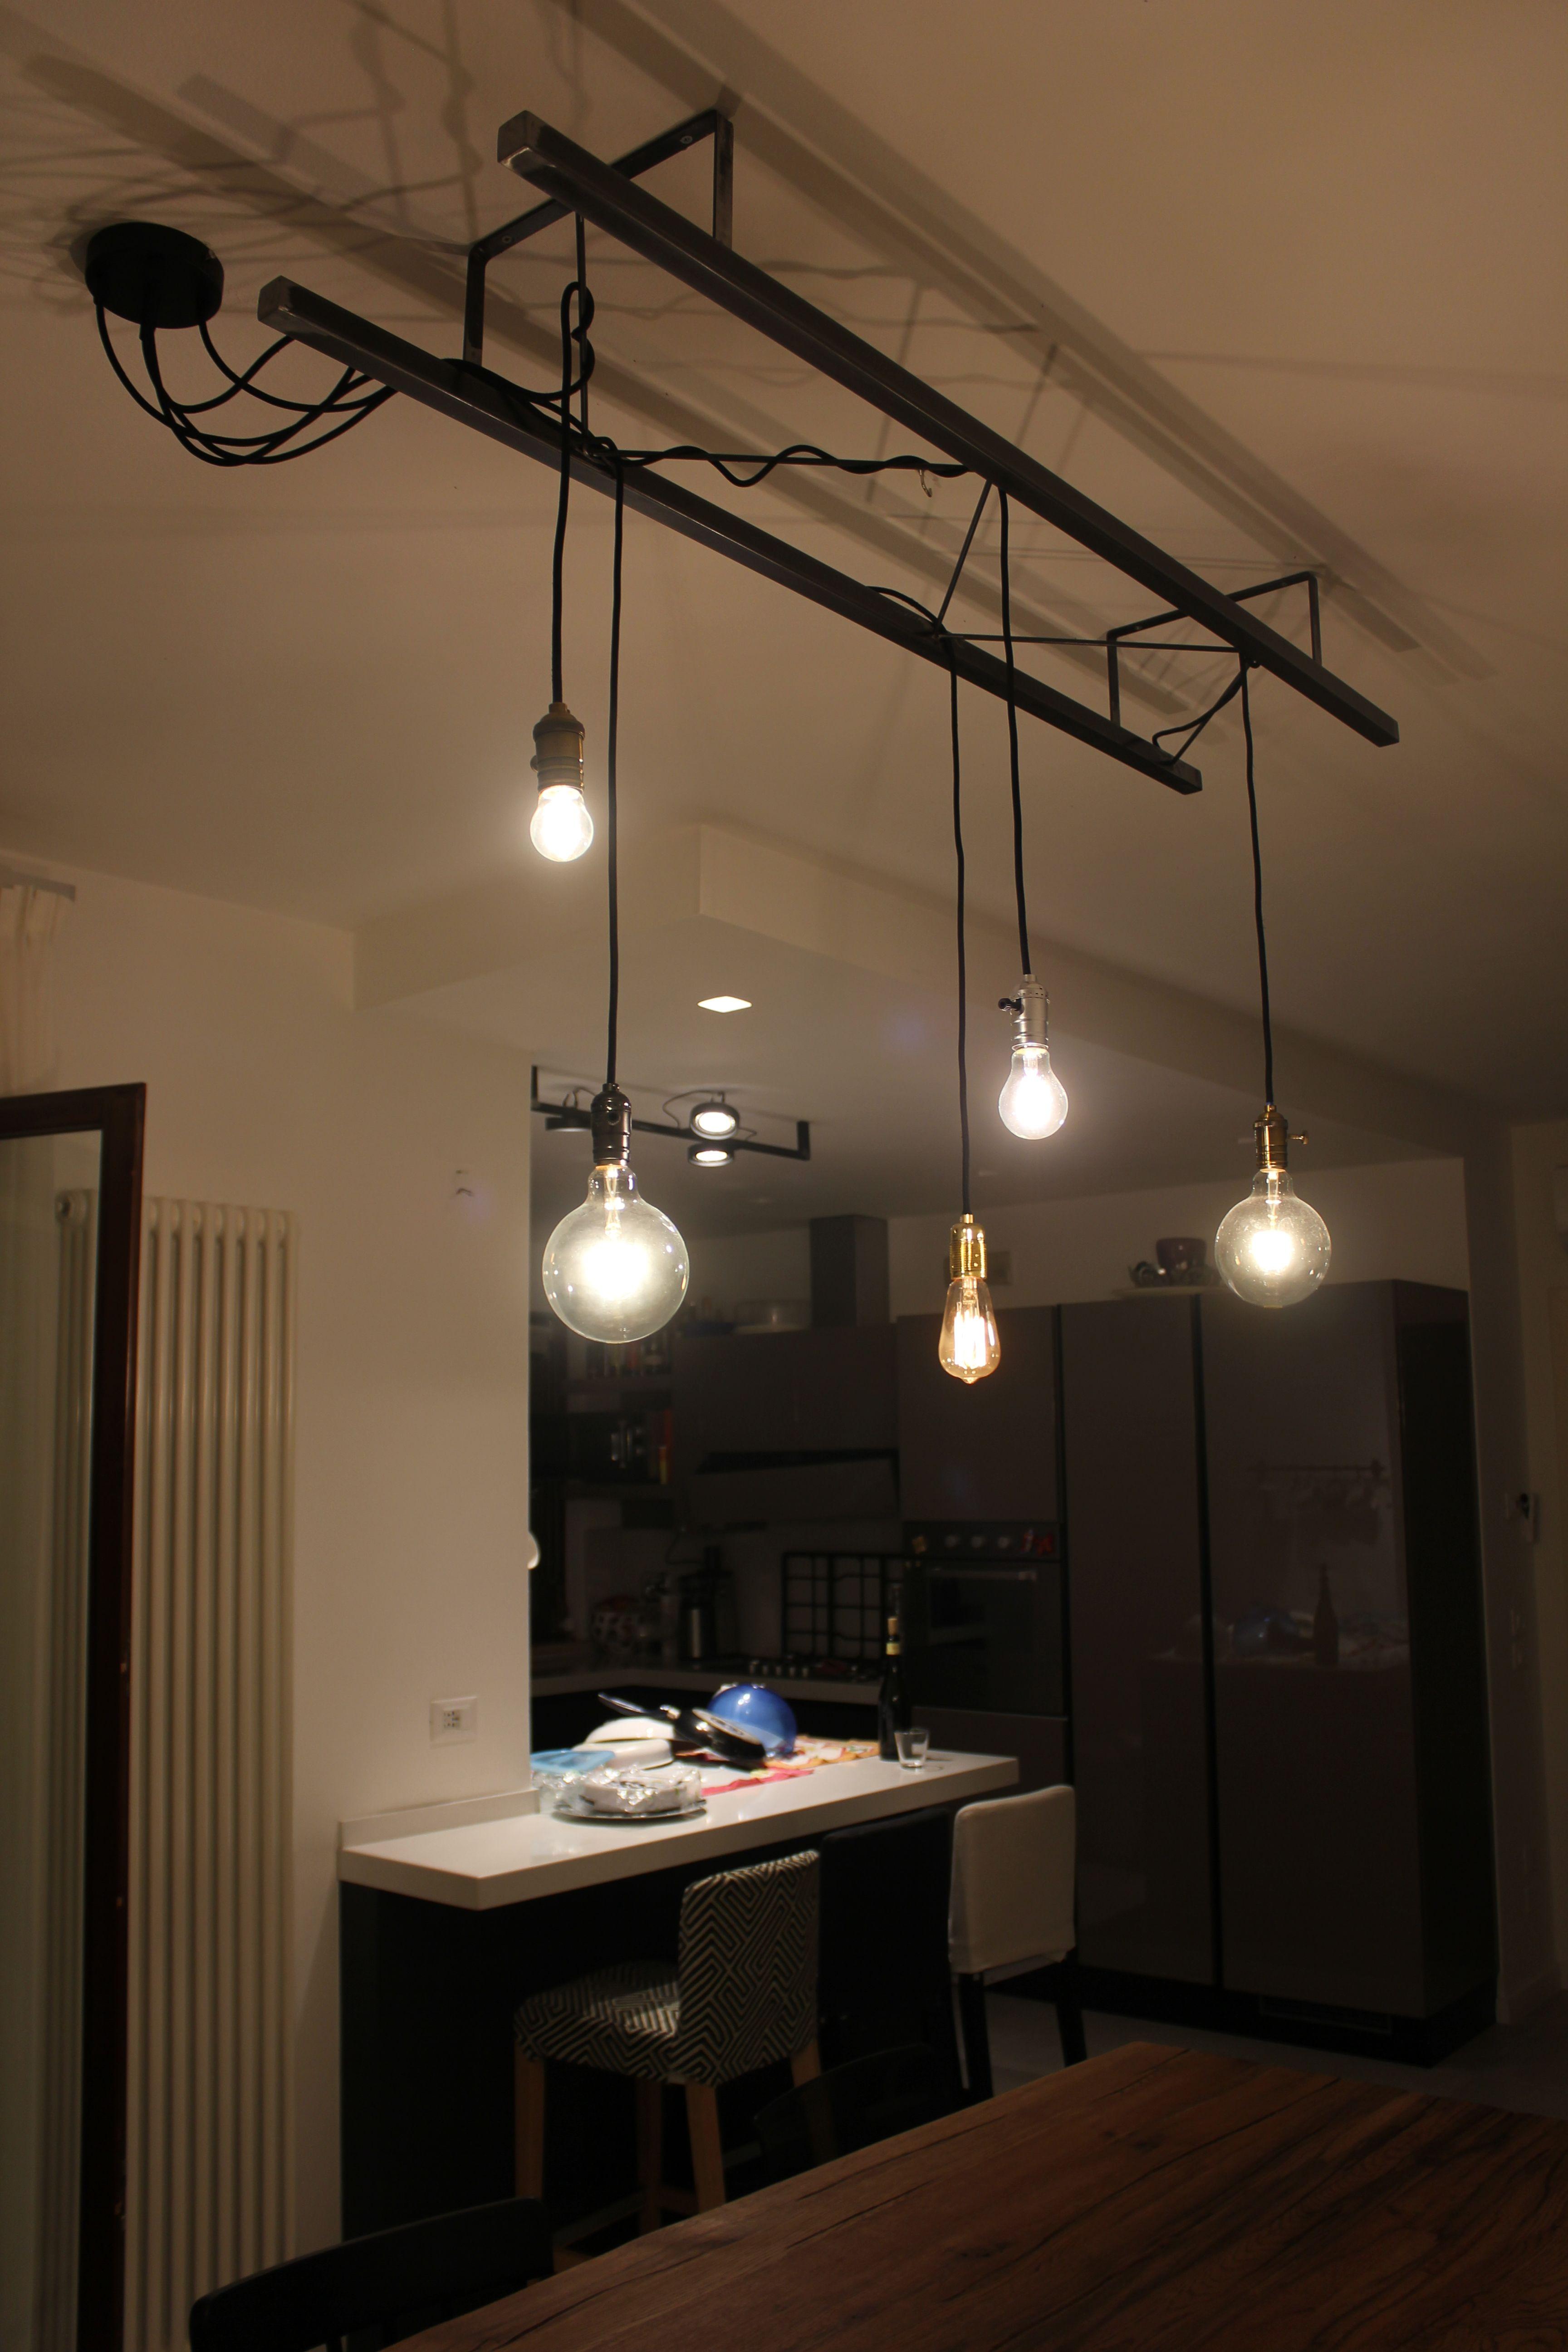 Lampada Vintage Industriale : Lampade per soggiorno vintage puzzle round lampada a soffitto o